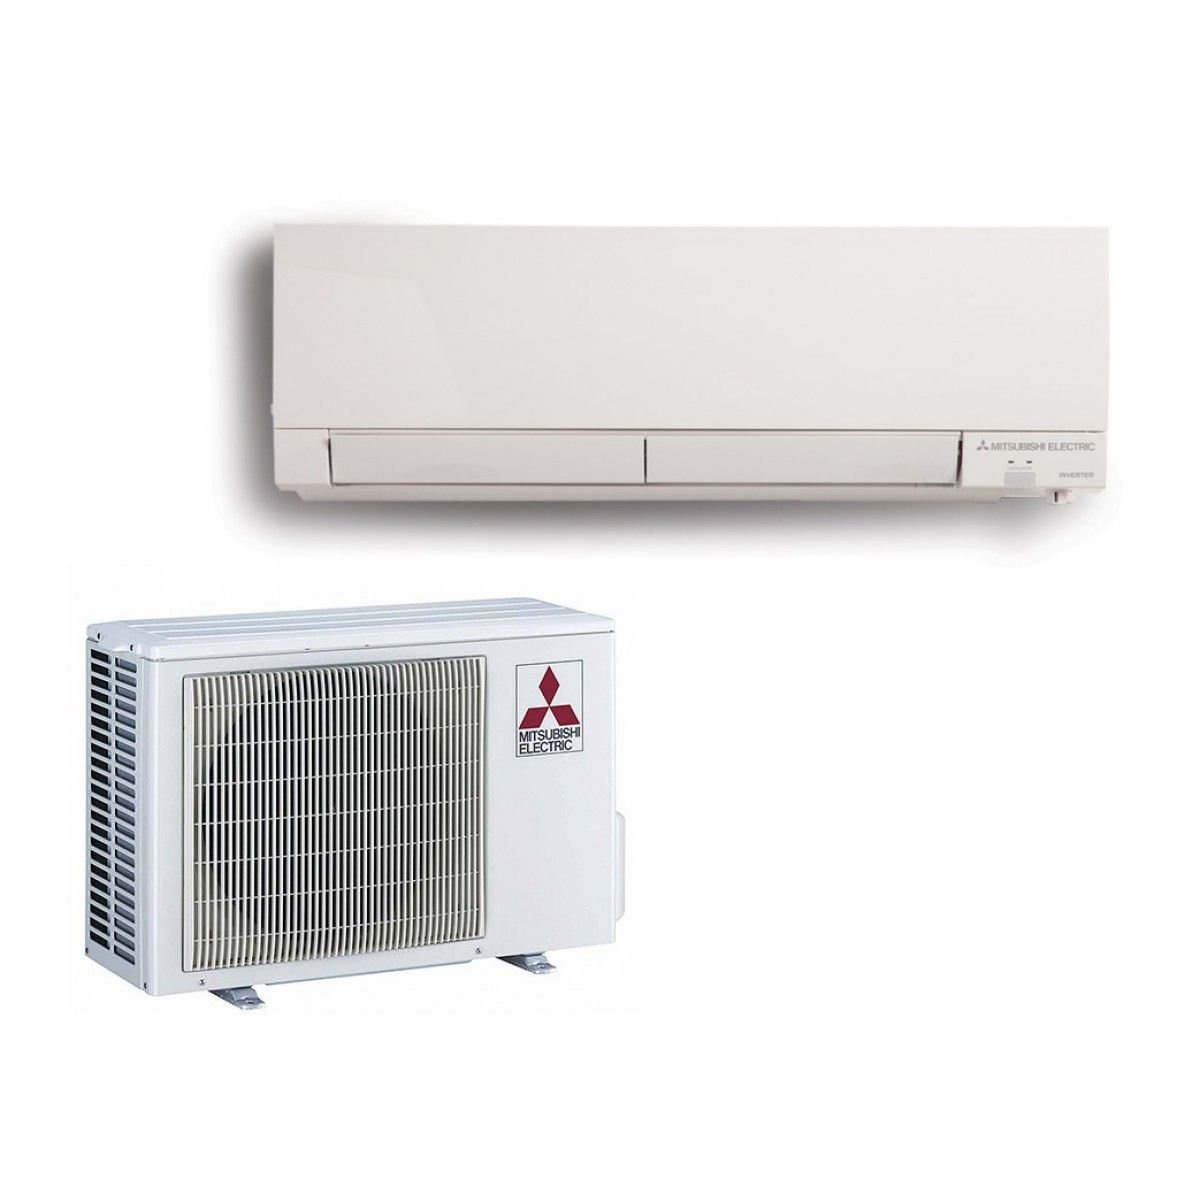 Mitsubishi 9 000 Btu Heat Pump Hyper Heat 30 Seer System Heat